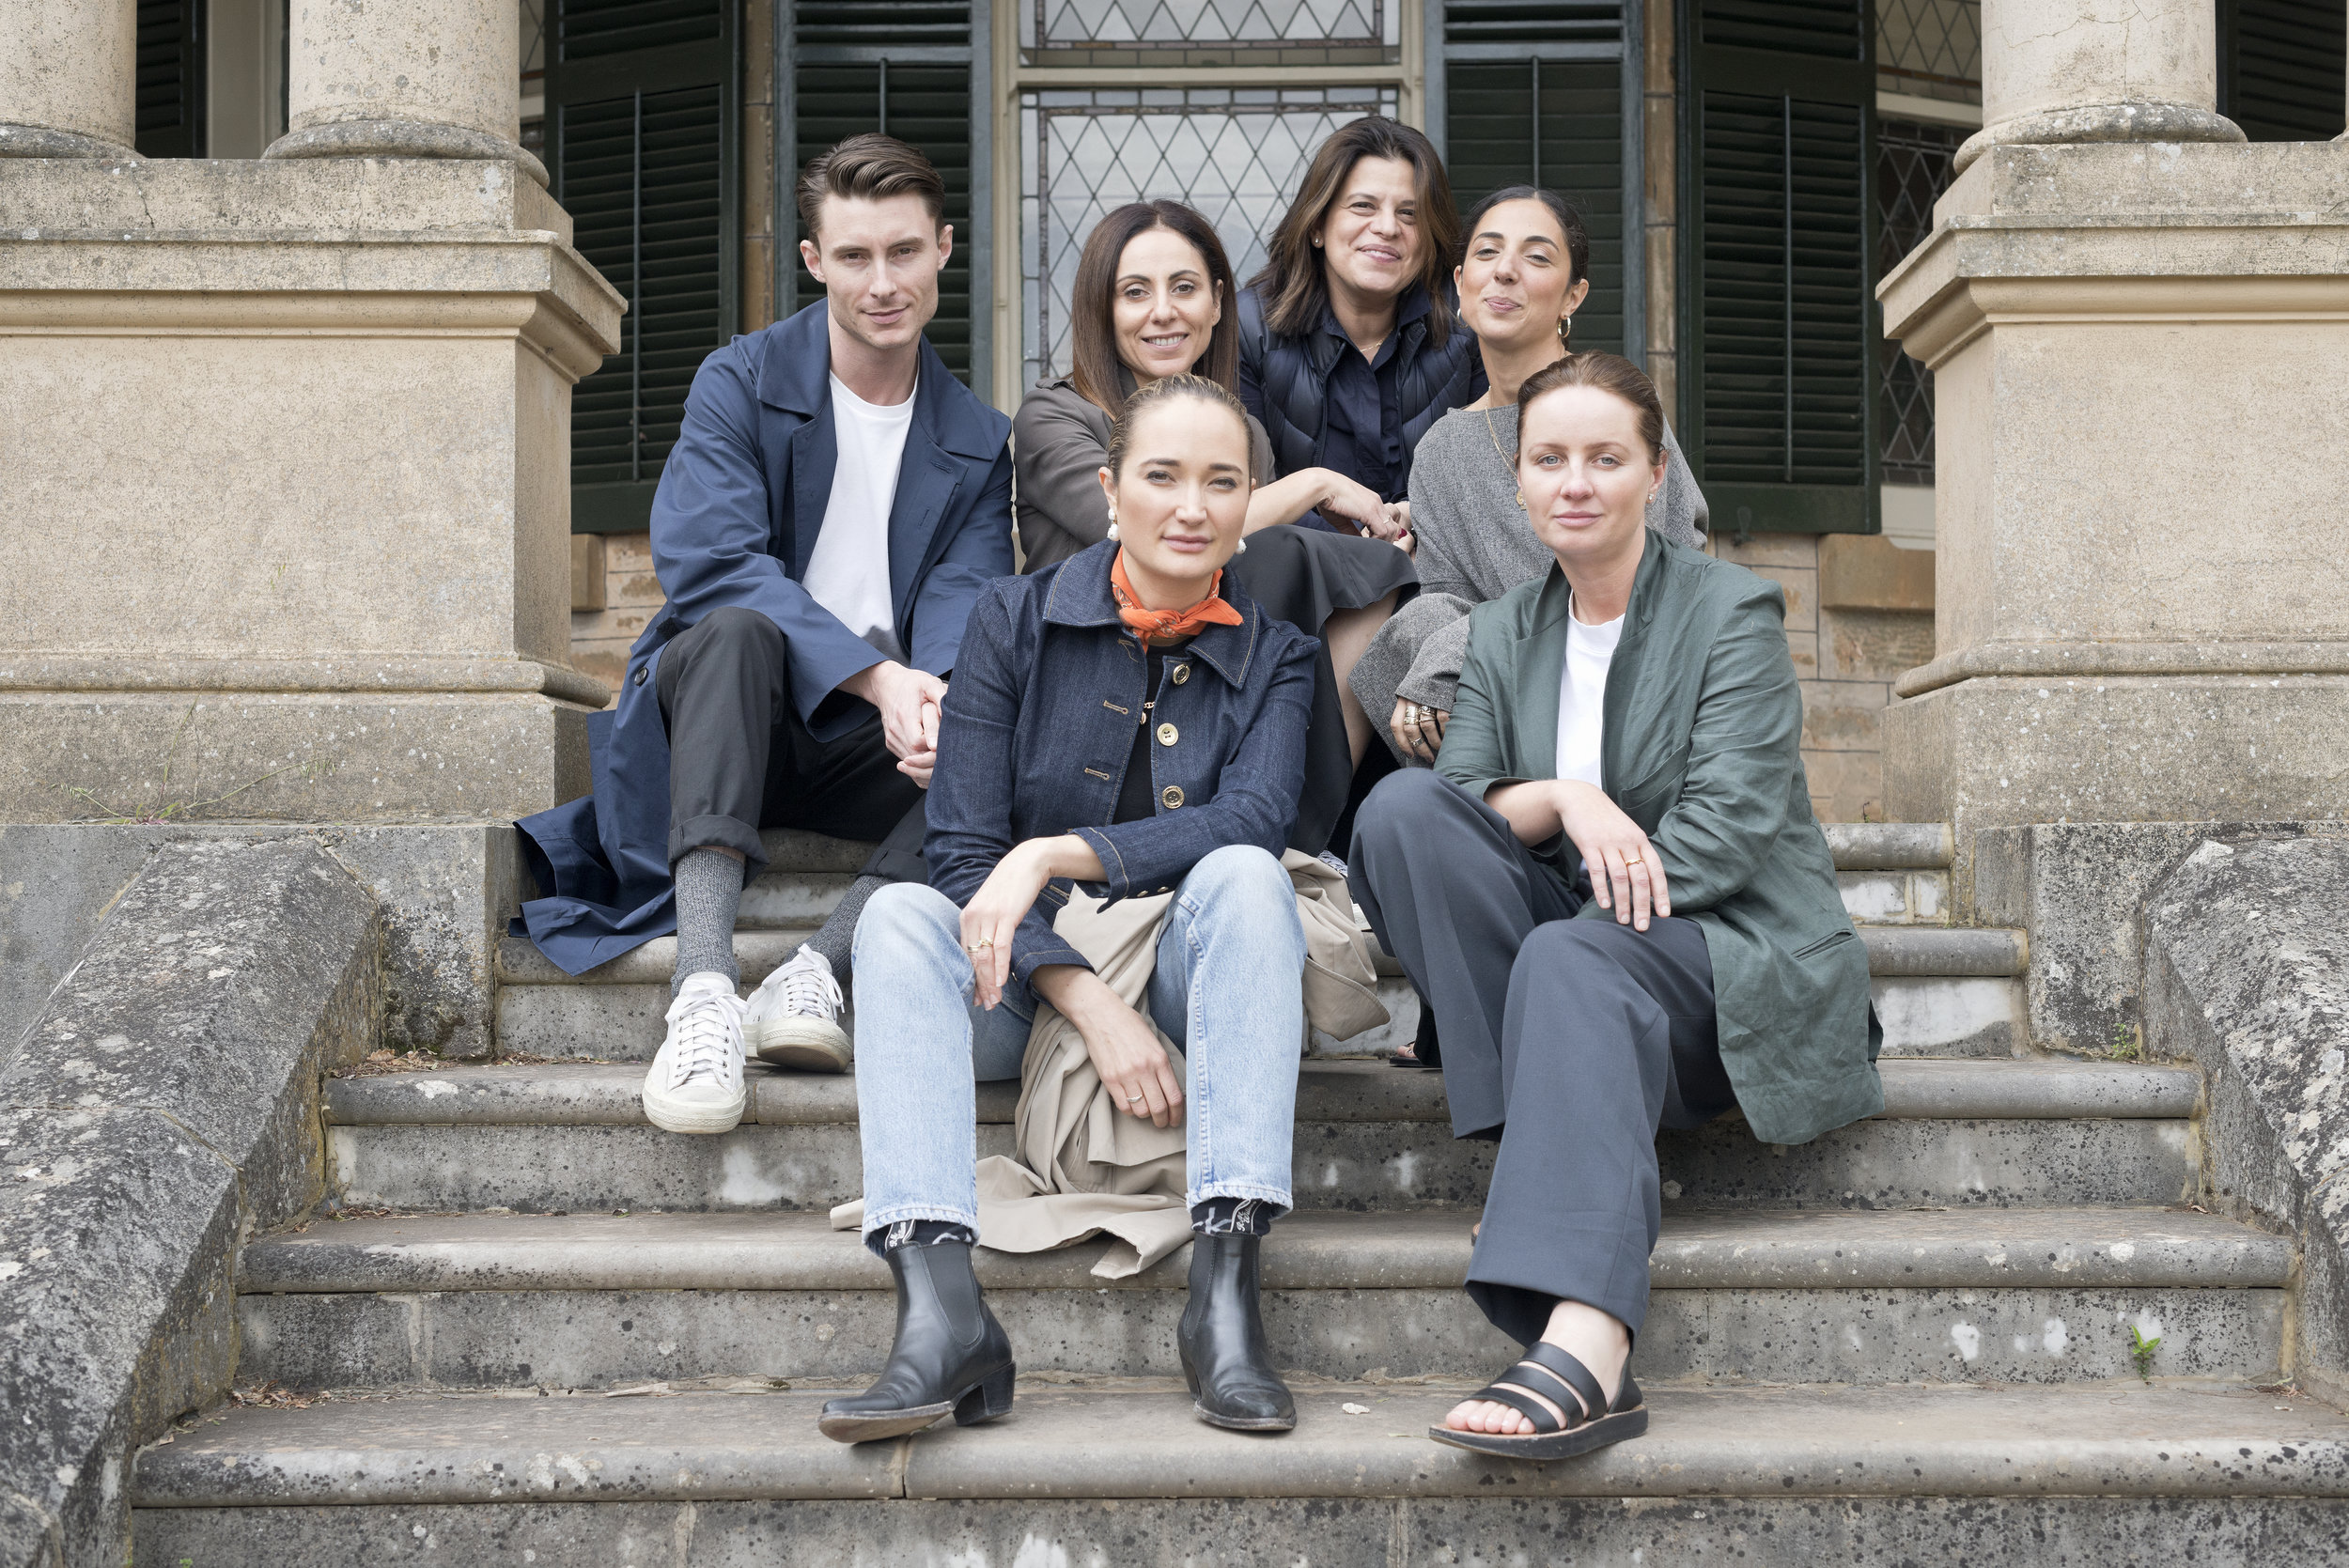 Blair Archibald, Margie Woods, Leila Hibri, Jacinta Demetriou, Marina Afonina and Ainsley Hansen at Anlaby Station | Image by    Andy Ellis